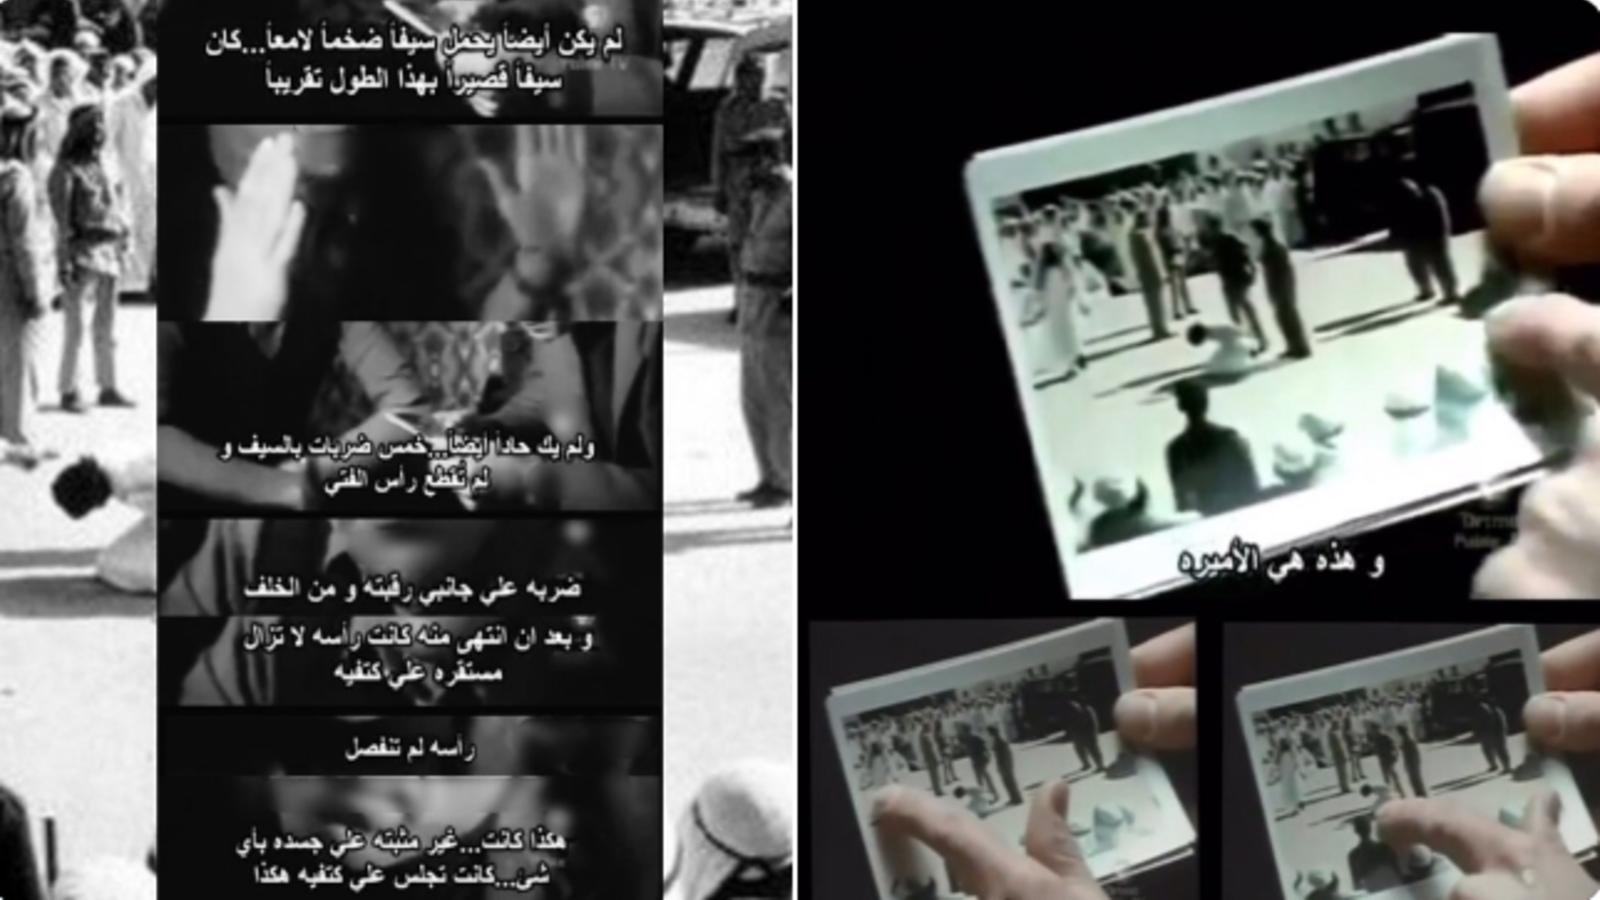 How a Tragic Royal Love Affair in 1977 Led to Saudi Arabia's Male